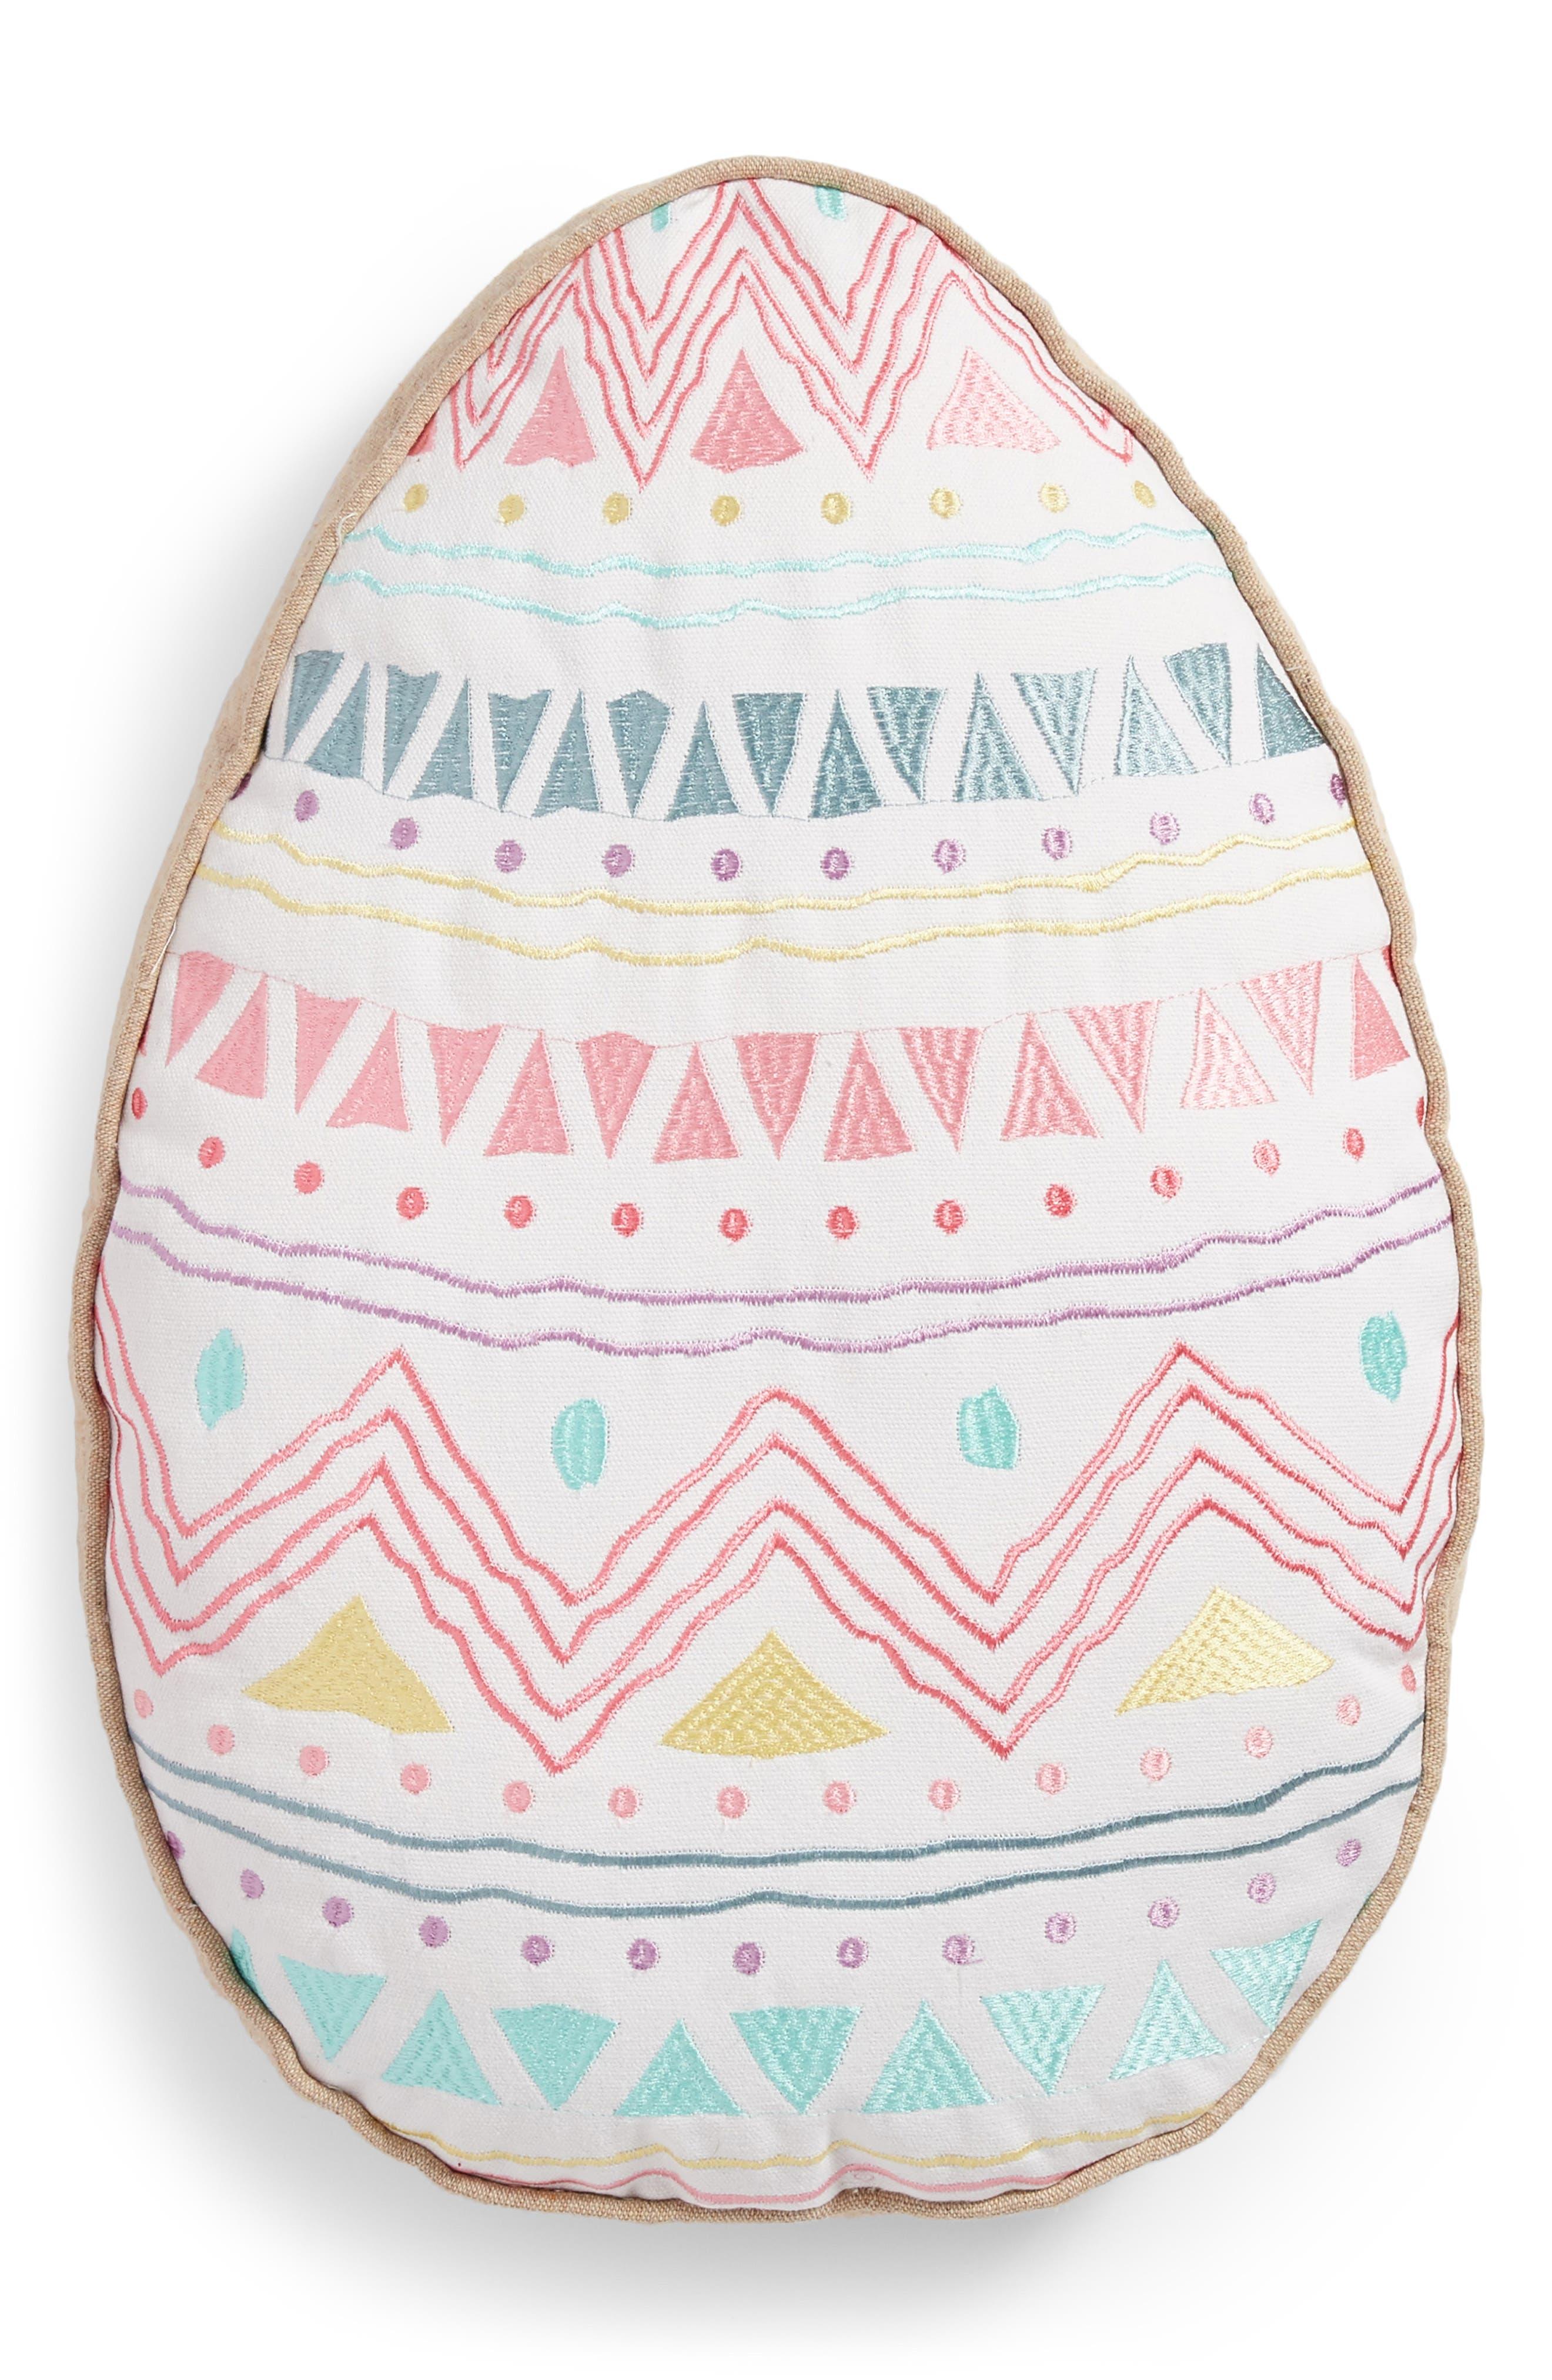 Egg Accent Pillow,                             Main thumbnail 1, color,                             100